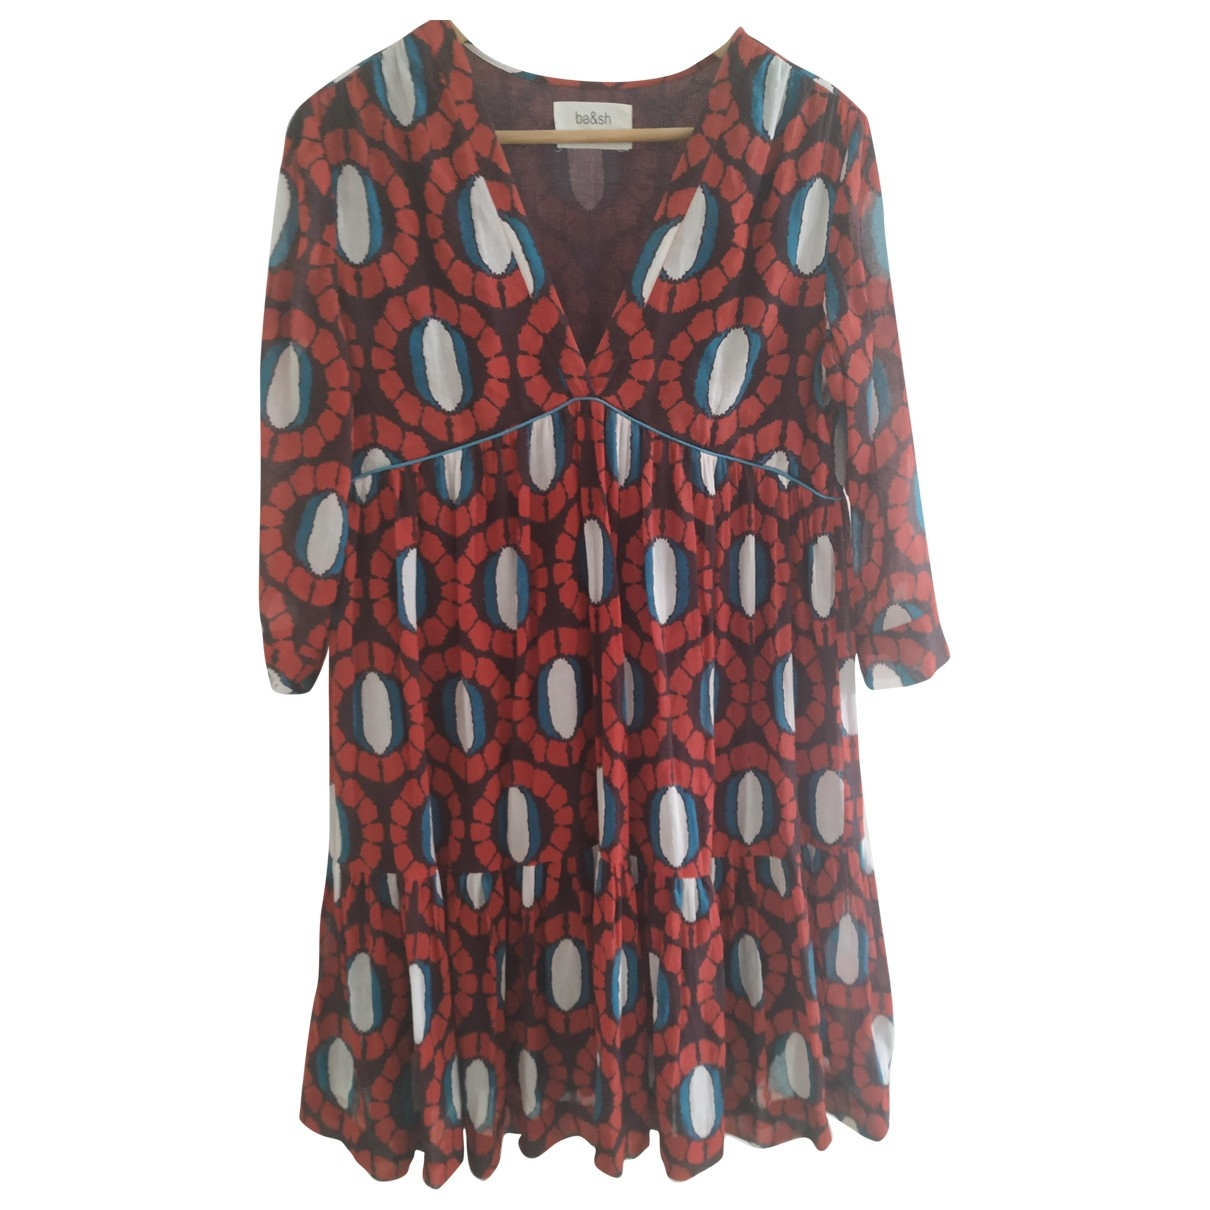 Ba&sh \N Red Cotton dress for Women 0 0-5